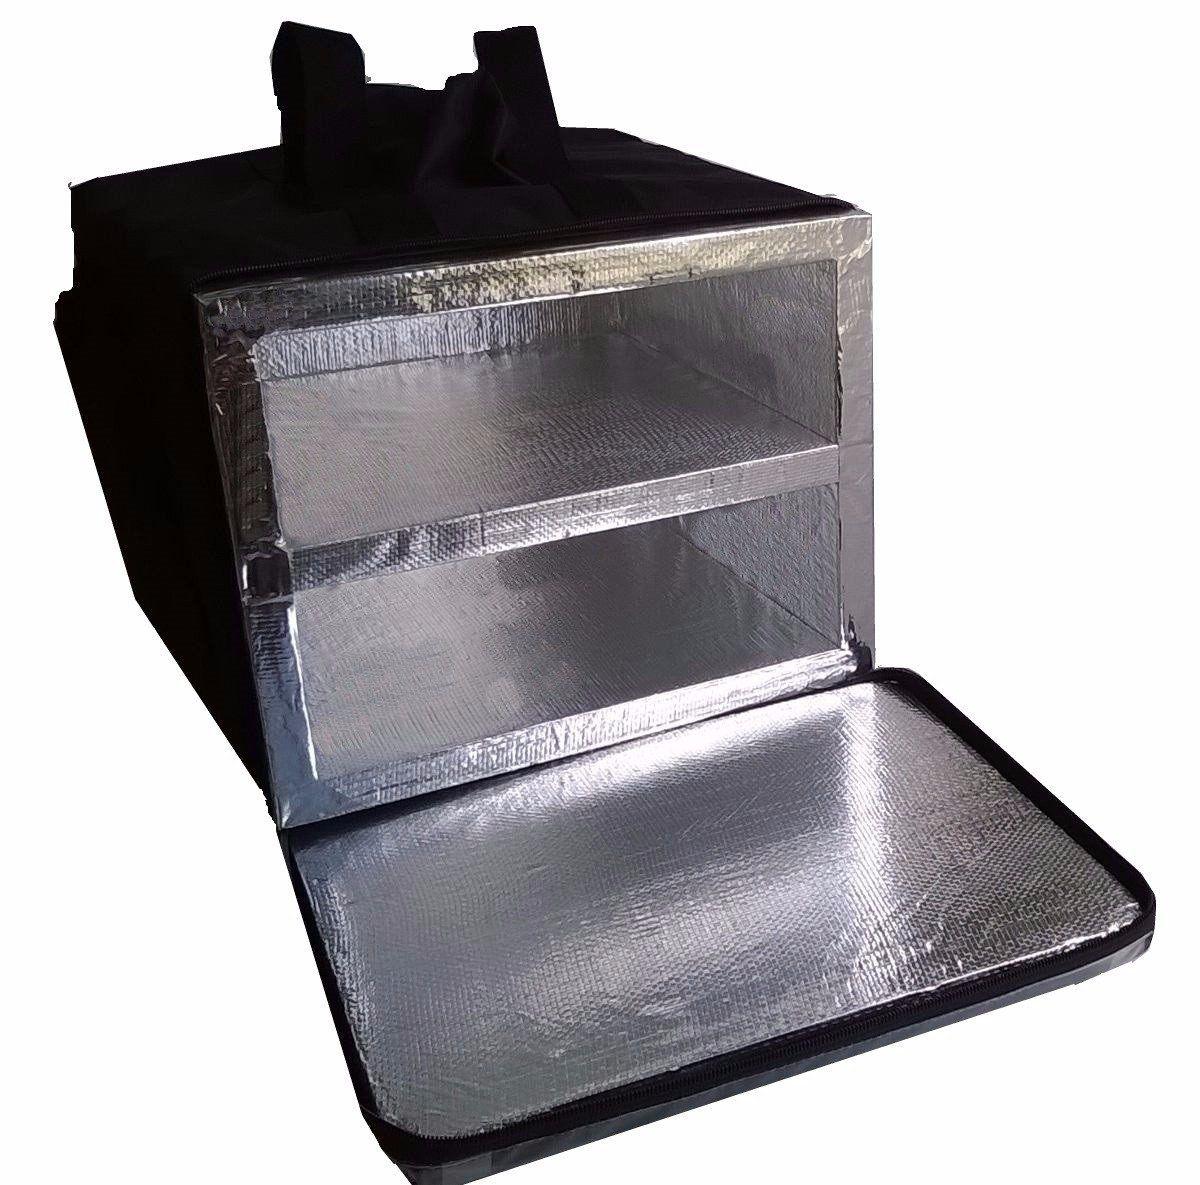 Mochila Bolsa Pizza Lanches 2 Divisórias Alumínio 44cm Bpal  - GuerreiroOnline